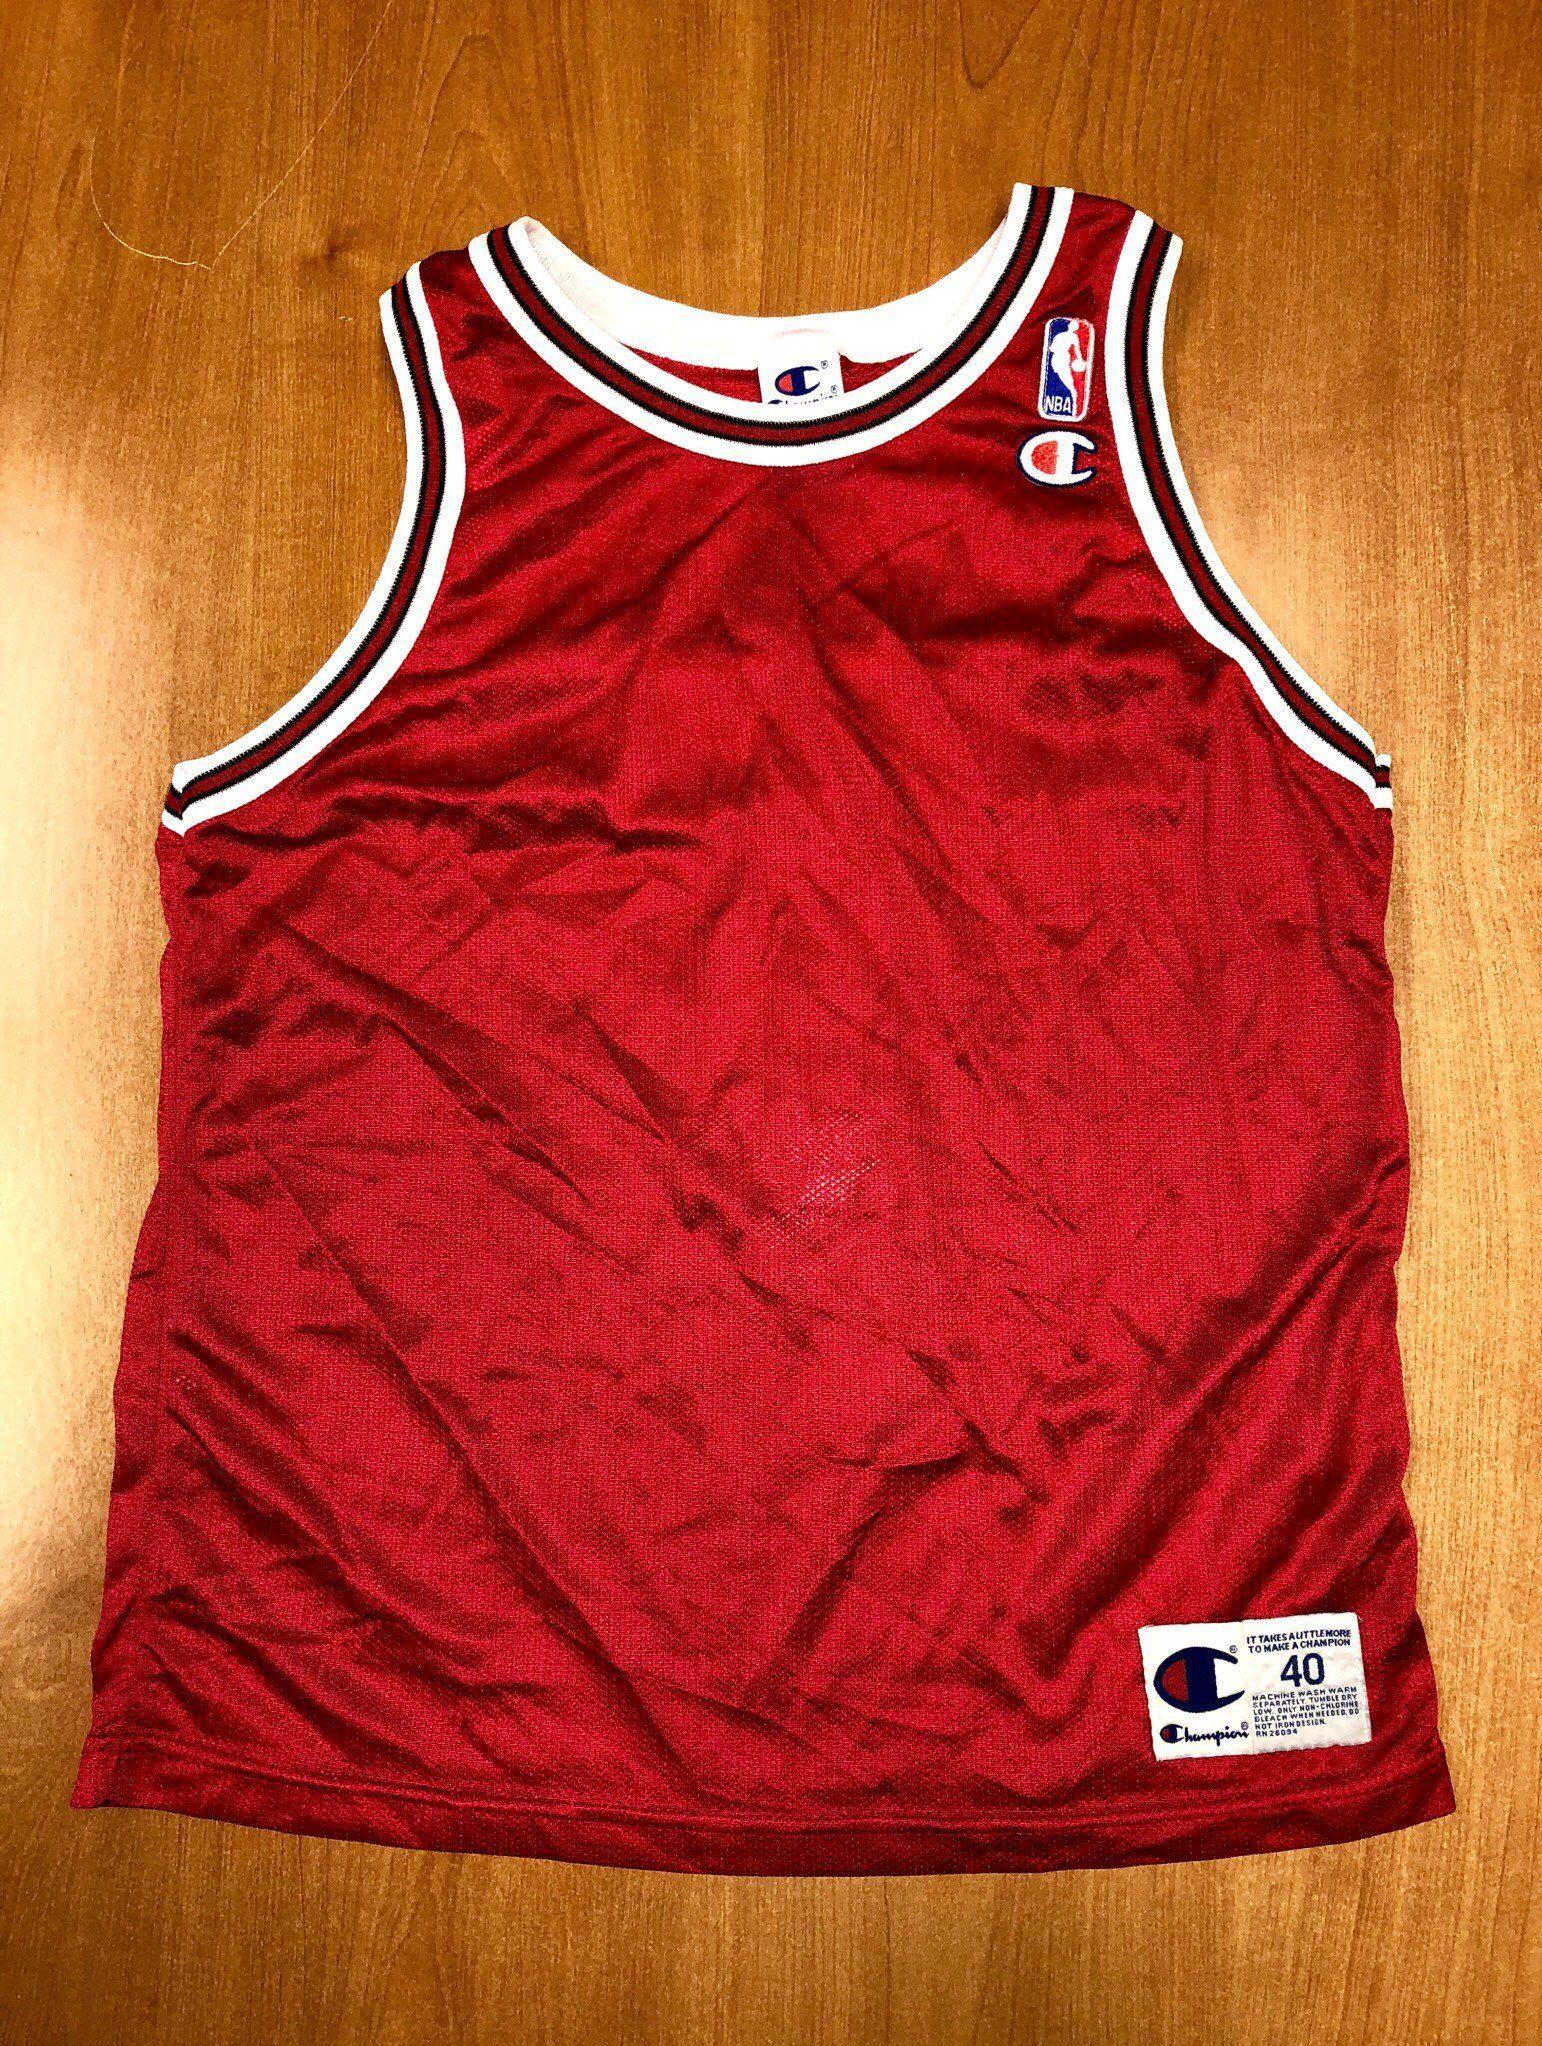 Vintage 1995 - 1998 Chicago Bulls Blank Champion Jersey Size 40 nba finals  hat shirt scottie pippen authentic michael jordan elton brand by ... 7068db6b6